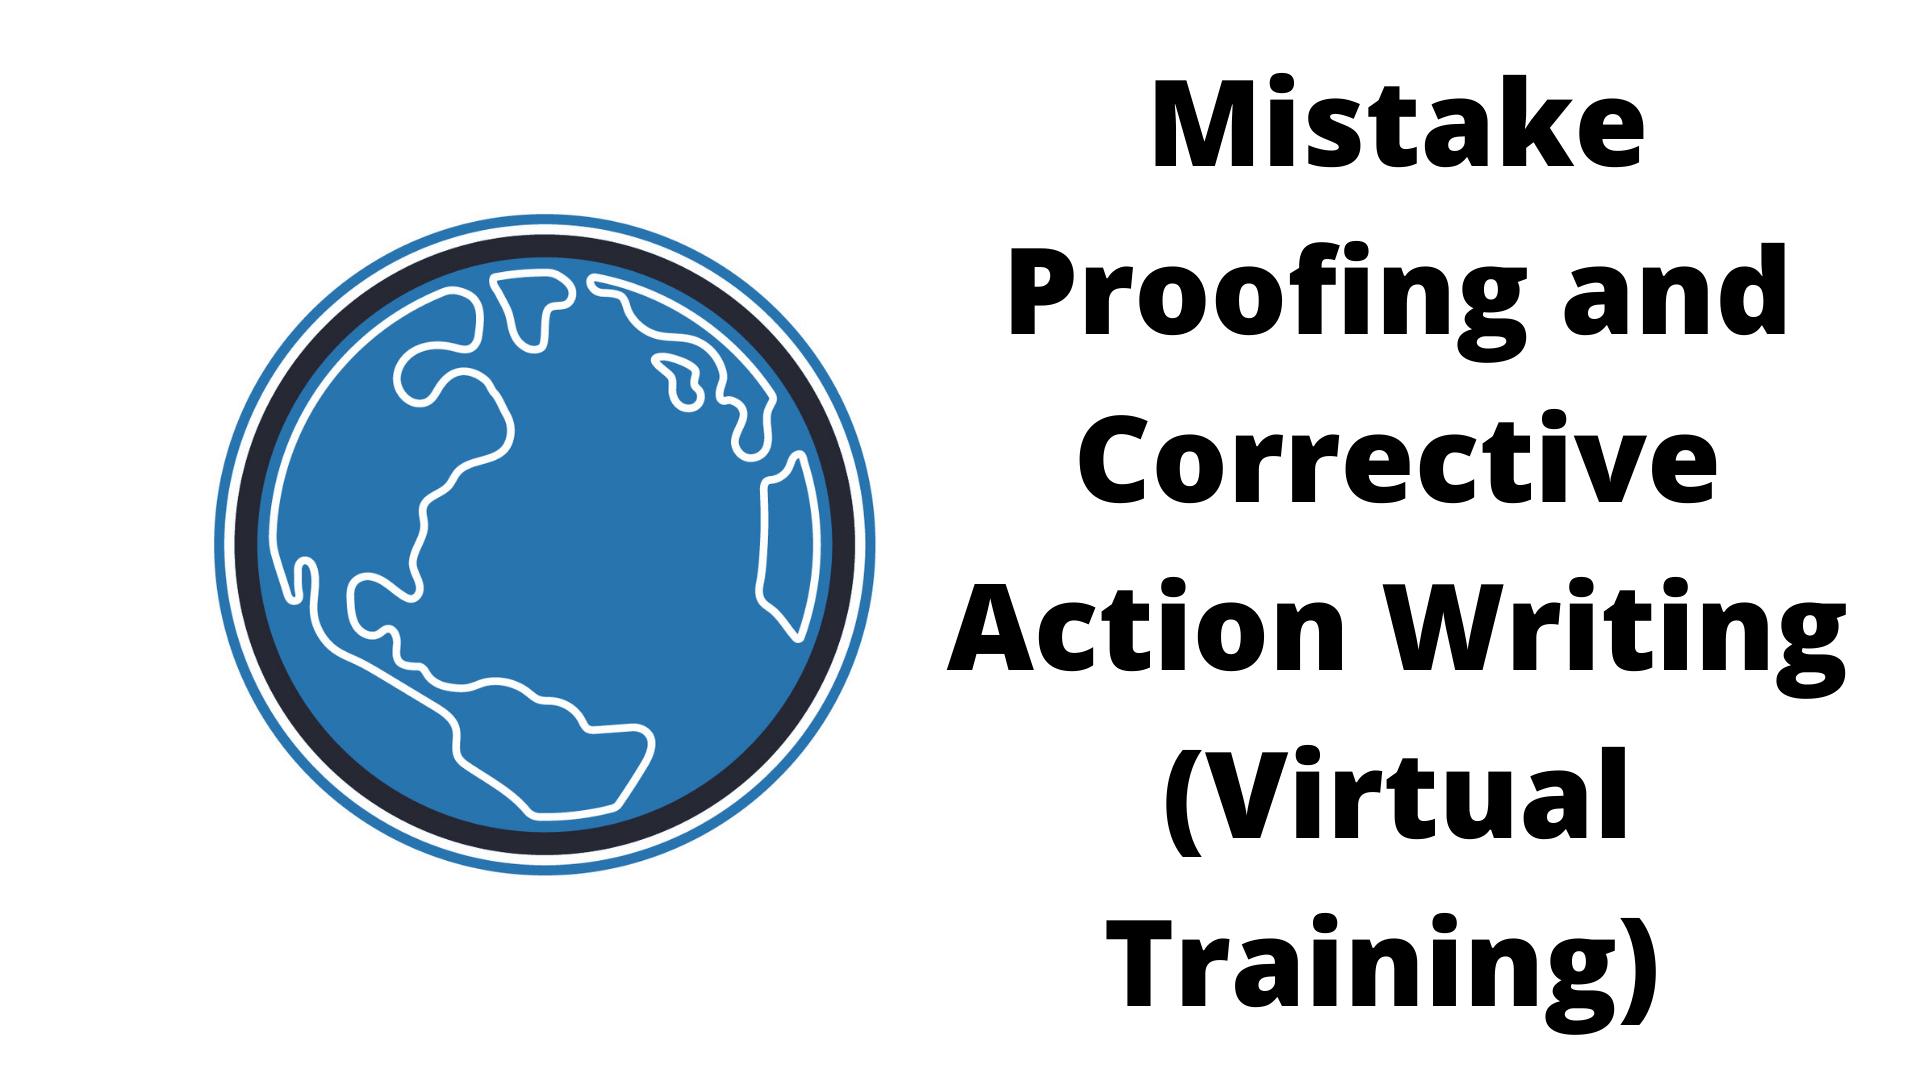 corrective action writing